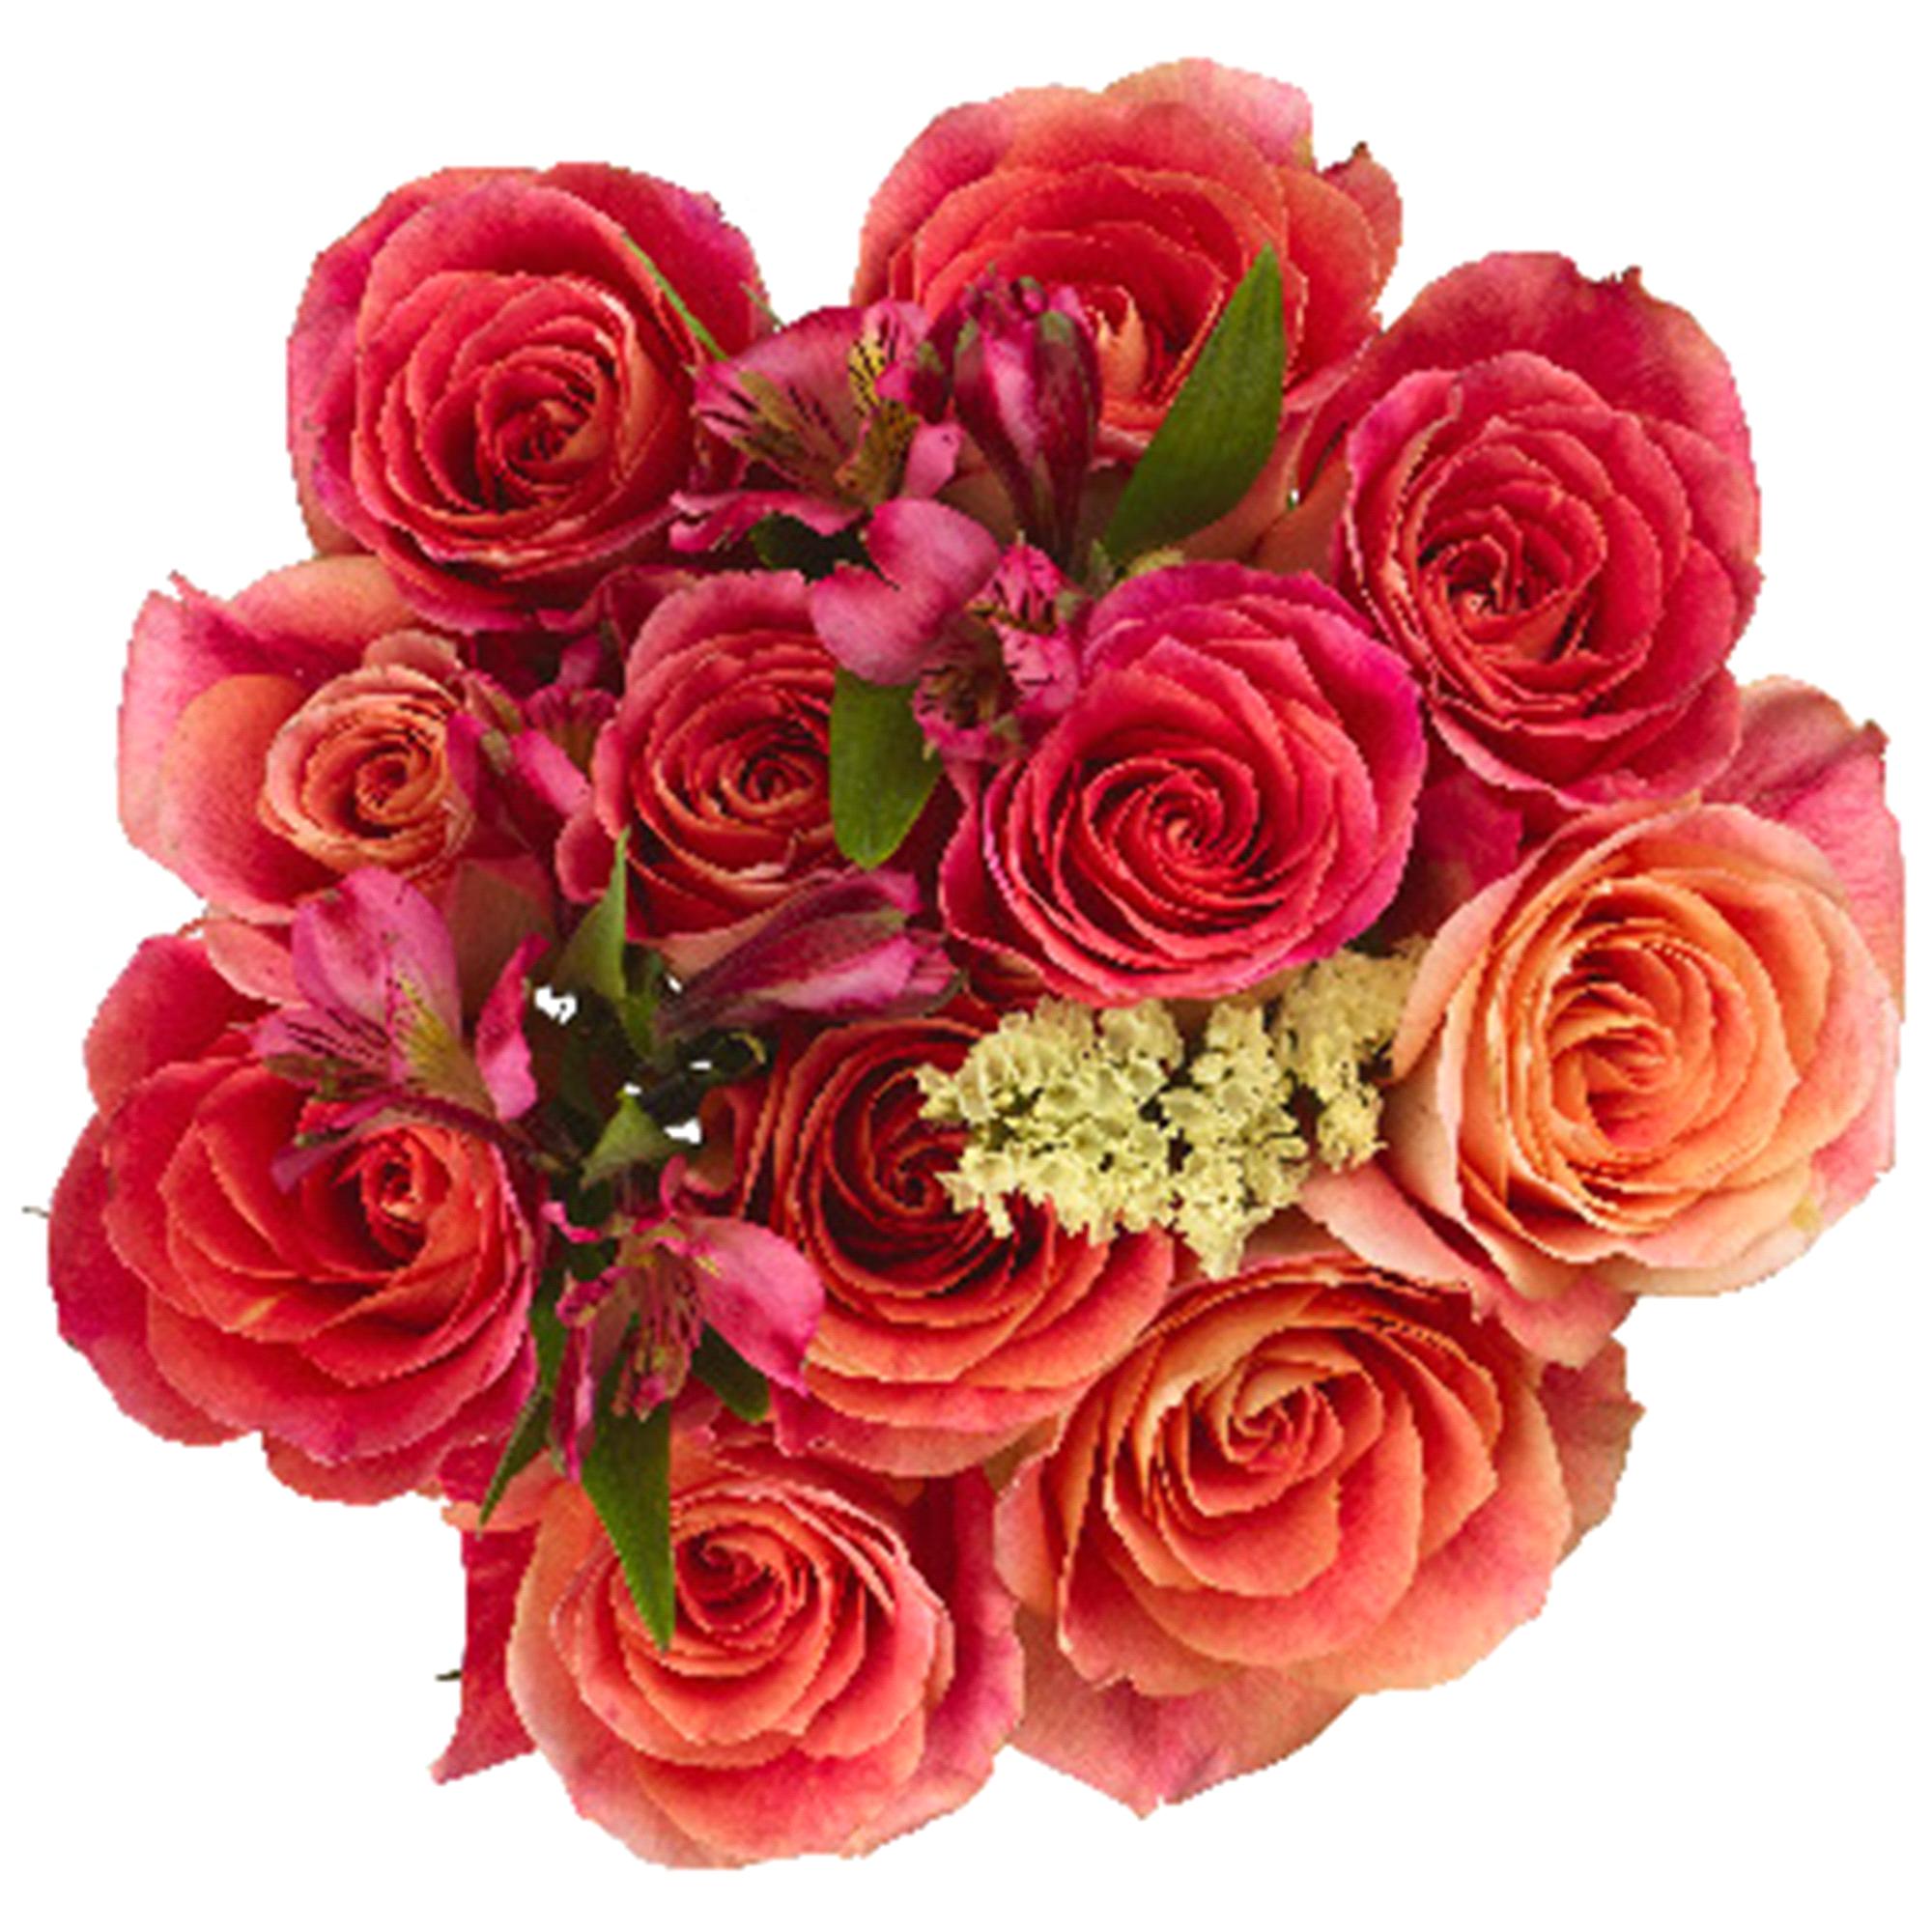 12 Count Fresh Rose Bouquet | Meijer.com